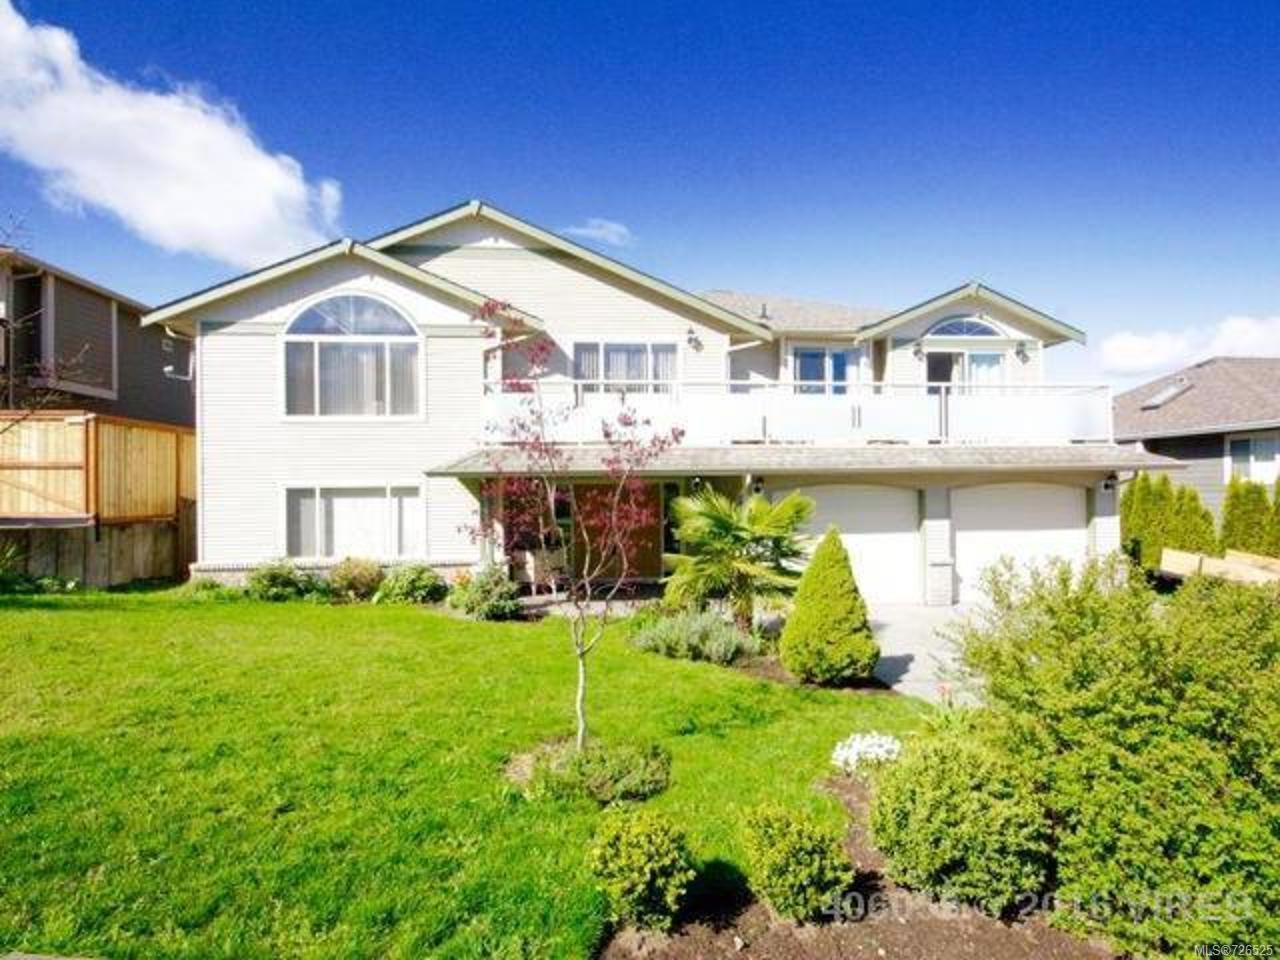 Main Photo: 355 Weaver Rd in NANAIMO: Na University District House for sale (Nanaimo)  : MLS®# 726525